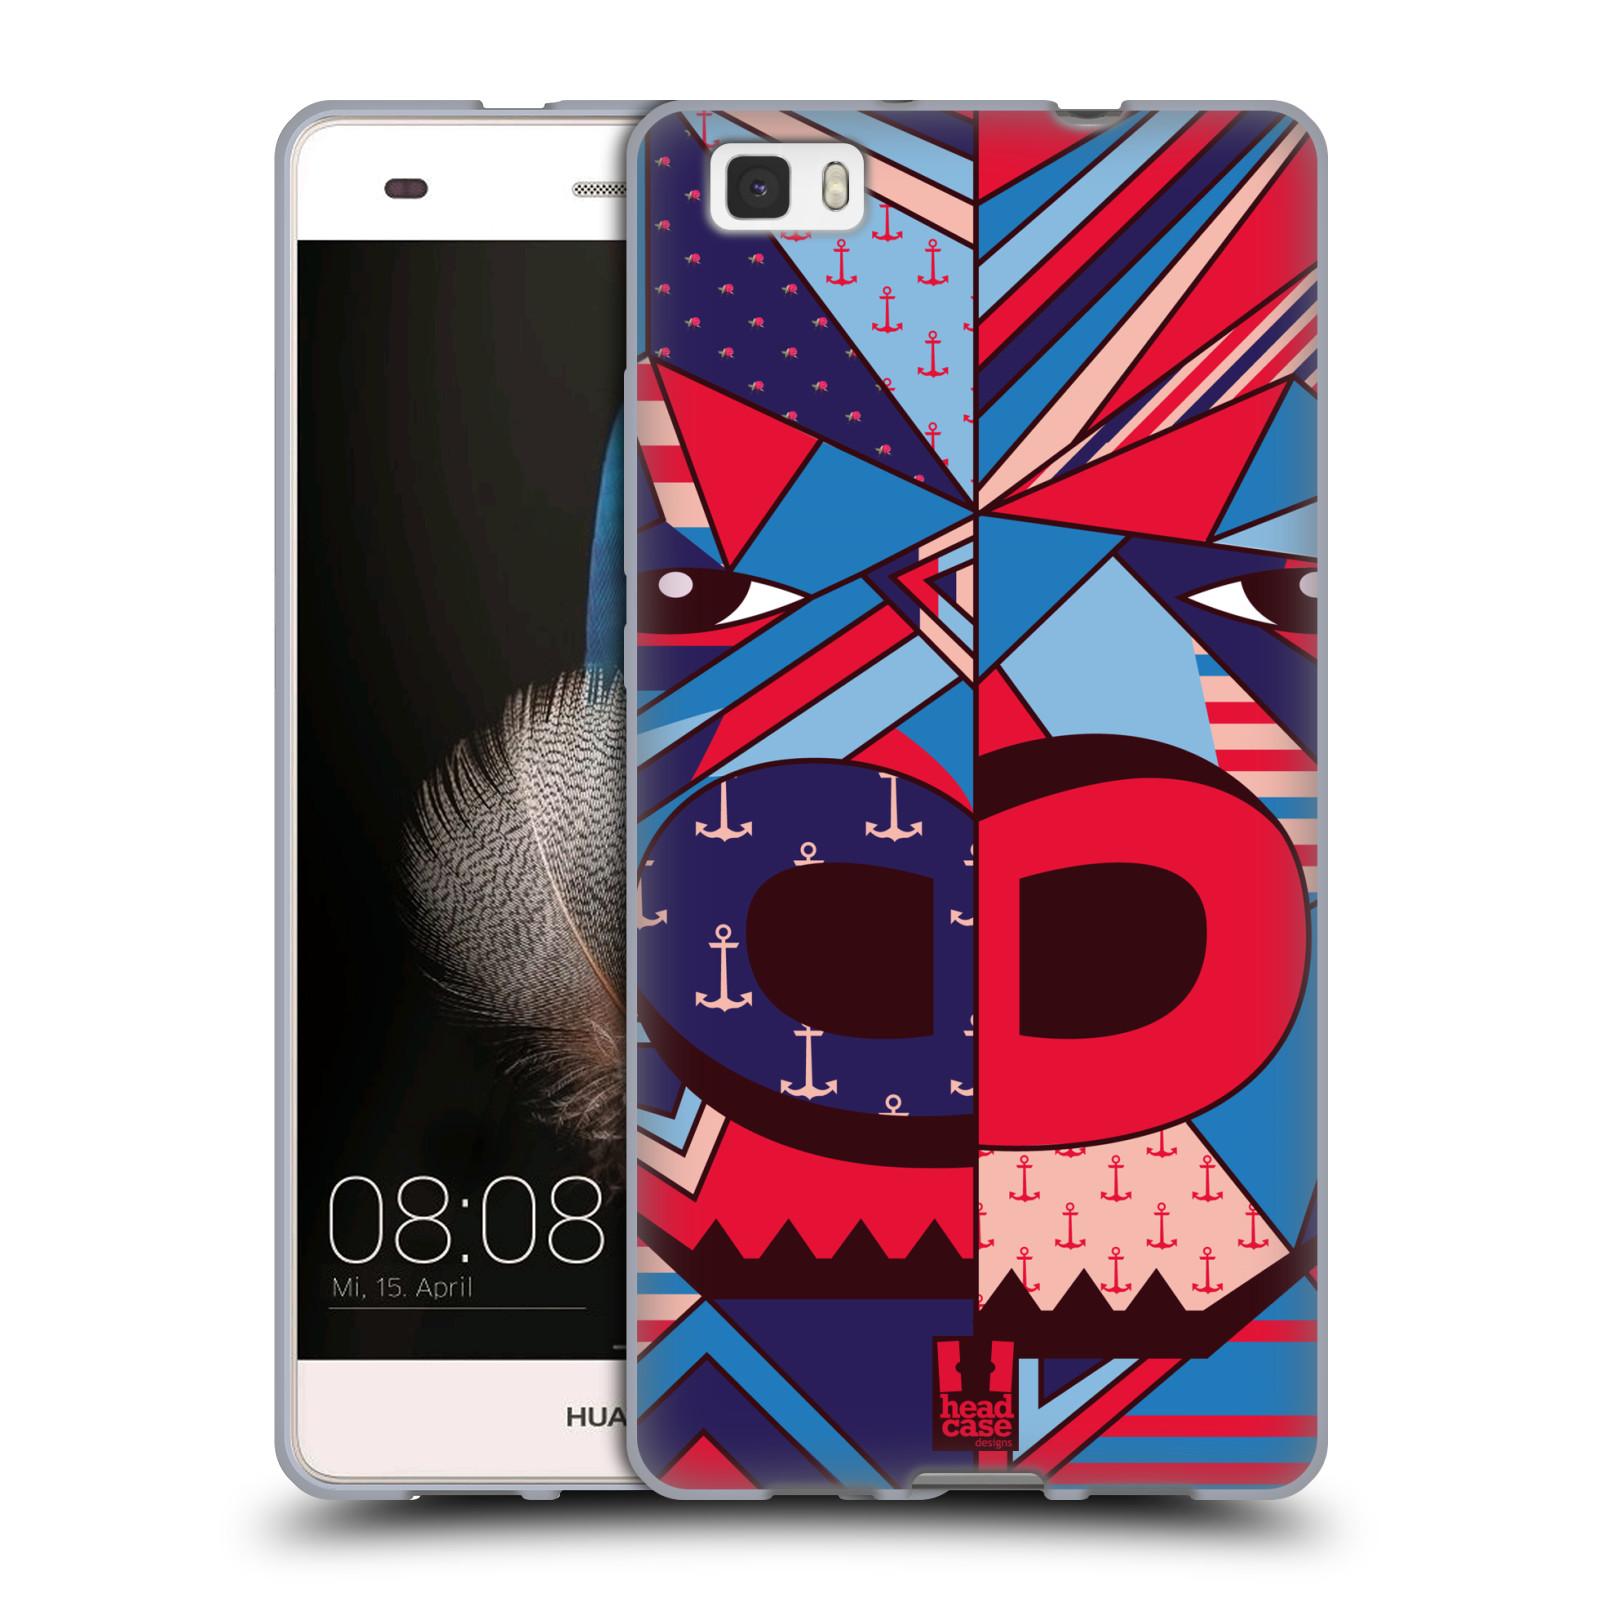 HEAD CASE silikonový obal na mobil Huawei Ascend P8 LITE Abstraktní zvířátka GORILA